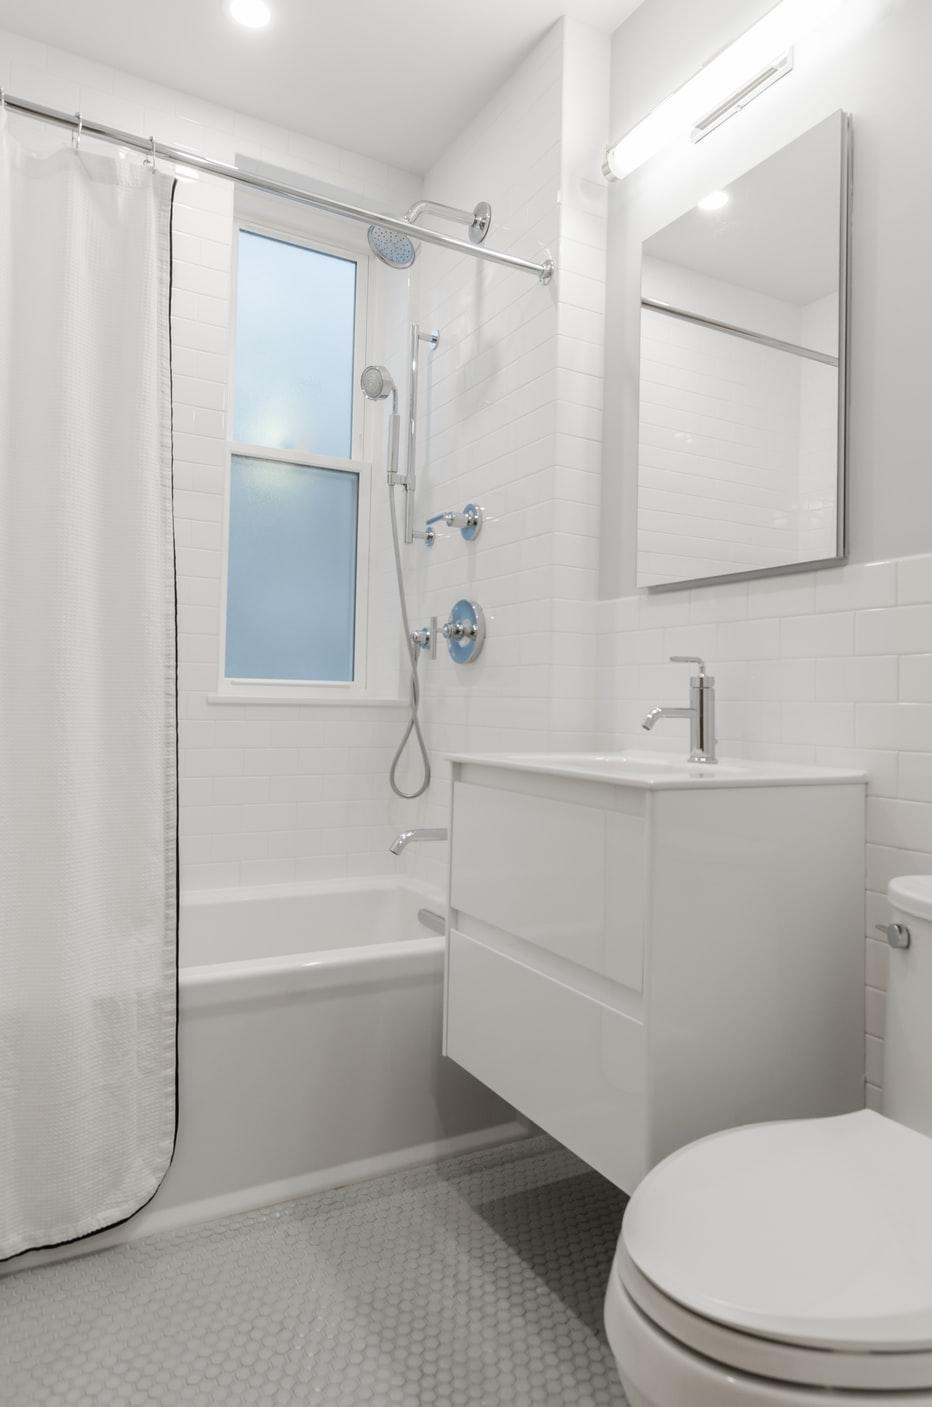 Non-slip rubber flooring for bathrooms